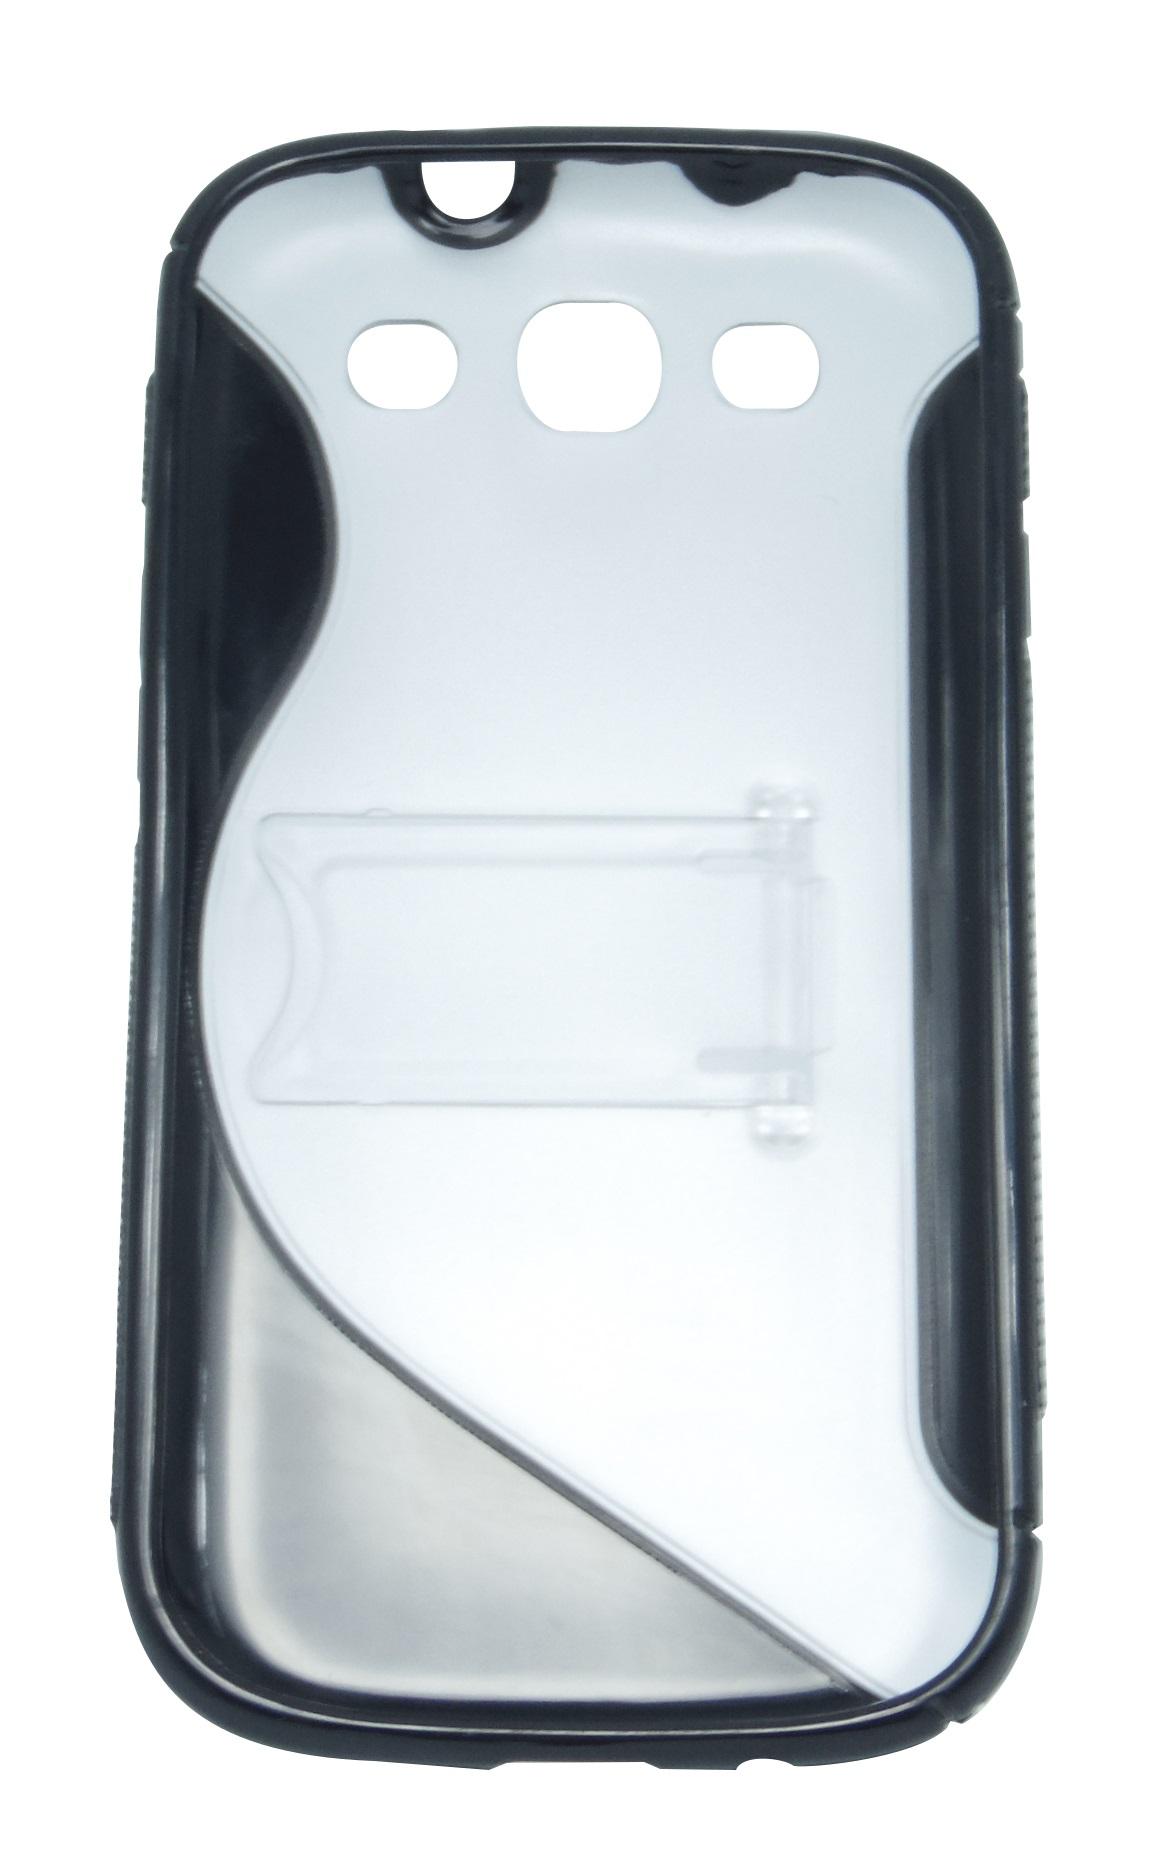 Husa silicon S-line negru+transparent cu stand pentru Samsung Galaxy S3 i9300 / Galaxy S3 LTE i9305